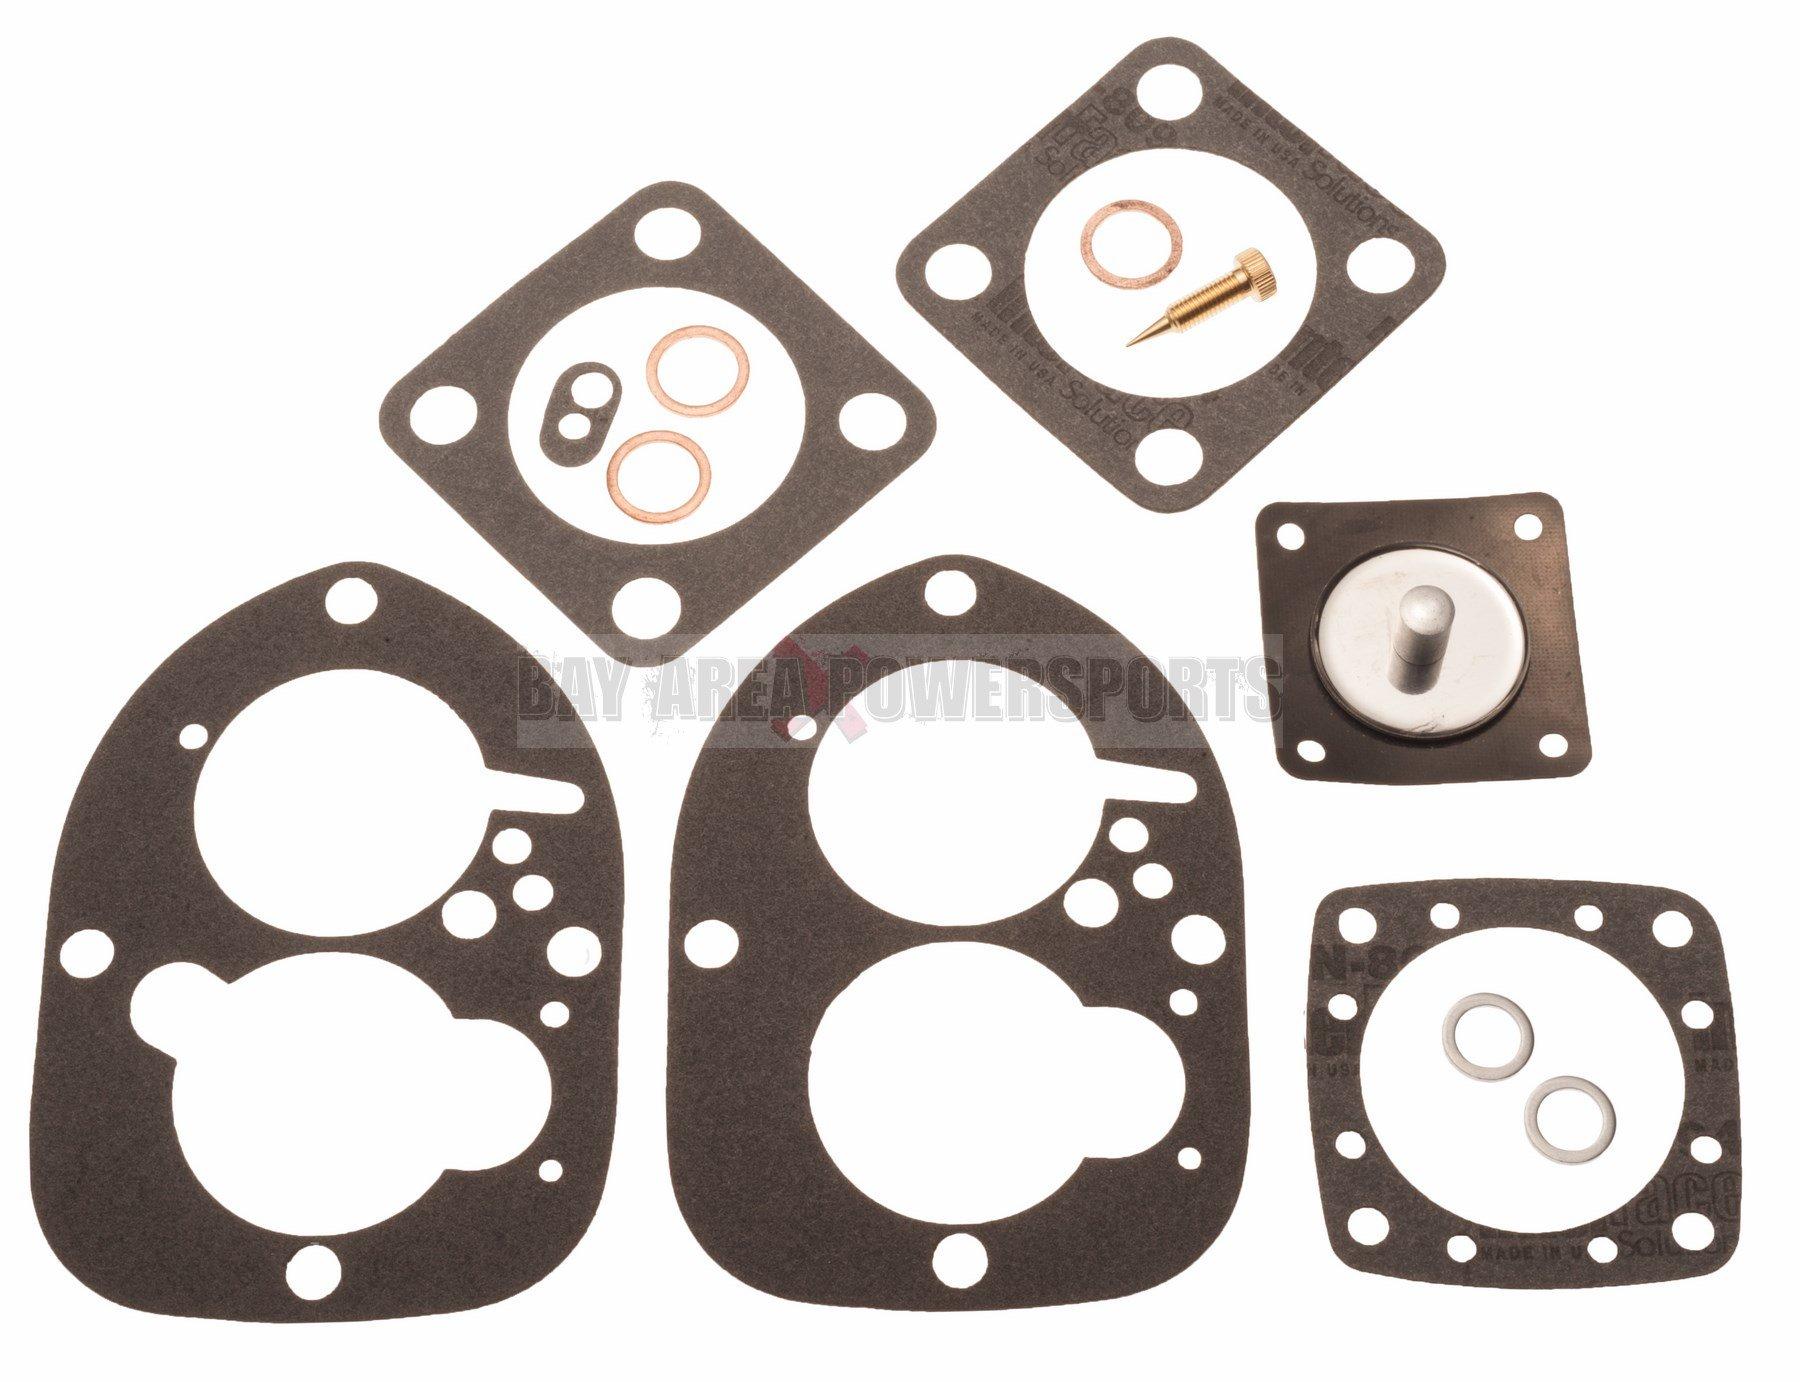 Carburetor Carb Rebuild Kit Volvo Penta 856471 856472 834527 AQ BB 115 125 130